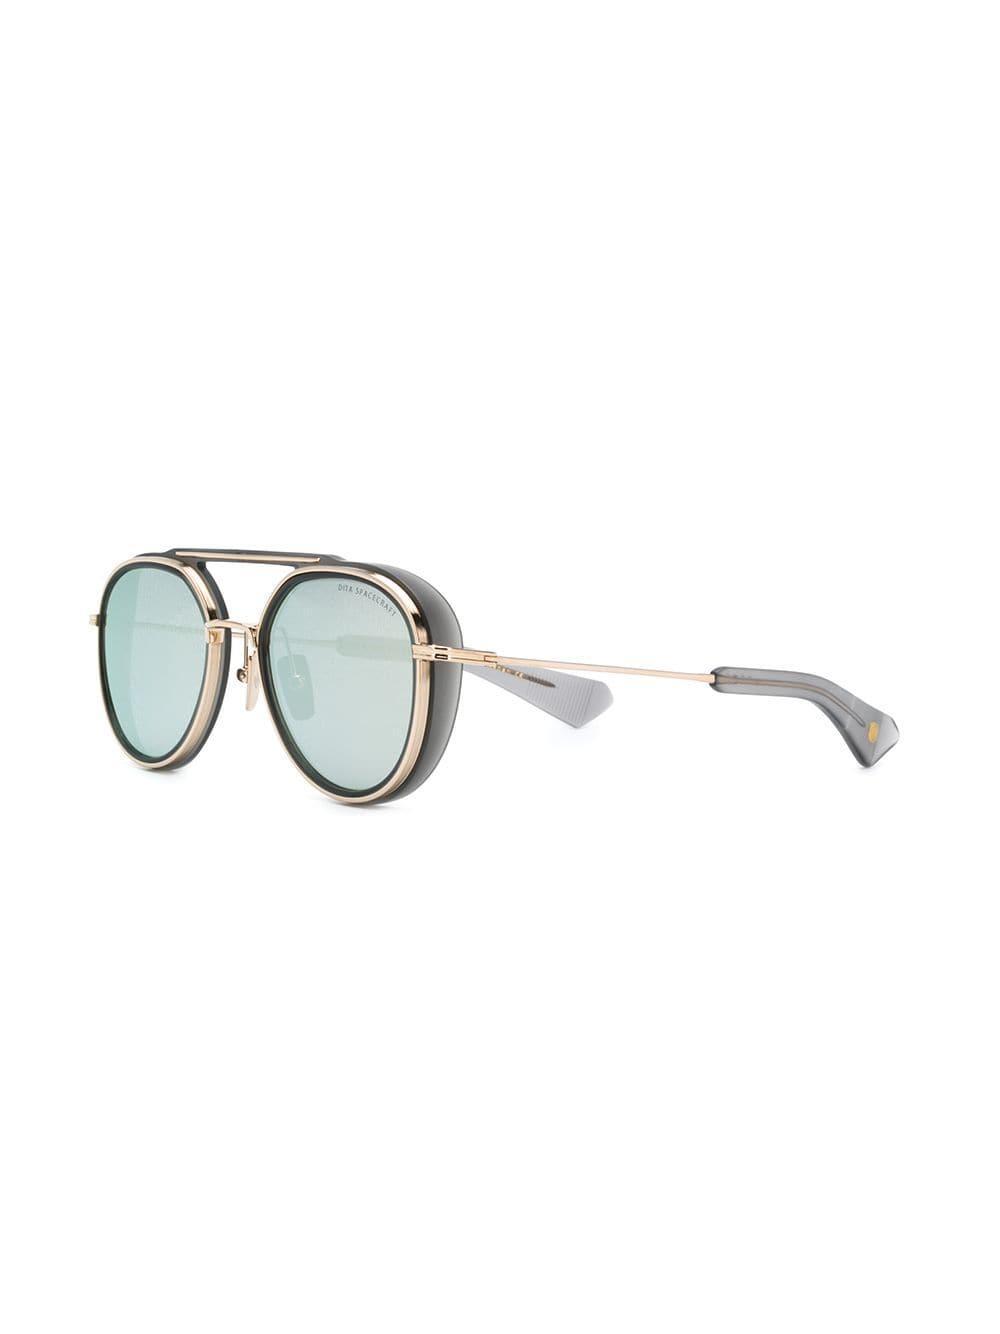 79eb95990819 Dita Eyewear Pilot-shaped Sunglasses in Gray - Lyst